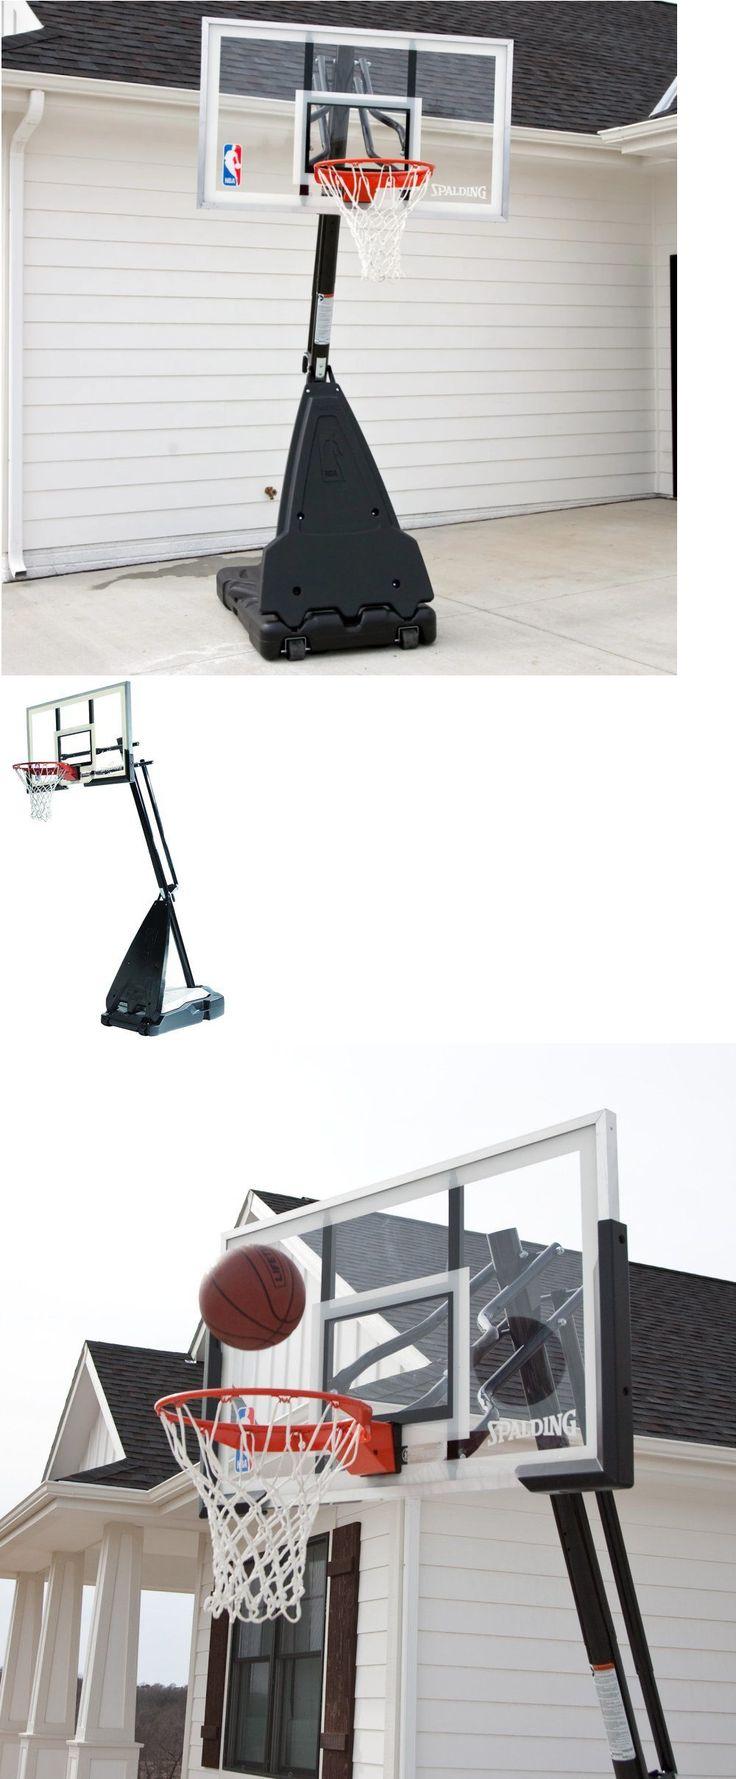 Backboard Systems 21196: 54 Spalding Basketball Hoop Nba Youth Portable Boys Adjustable Jordans Mens -> BUY IT NOW ONLY: $279 on eBay!